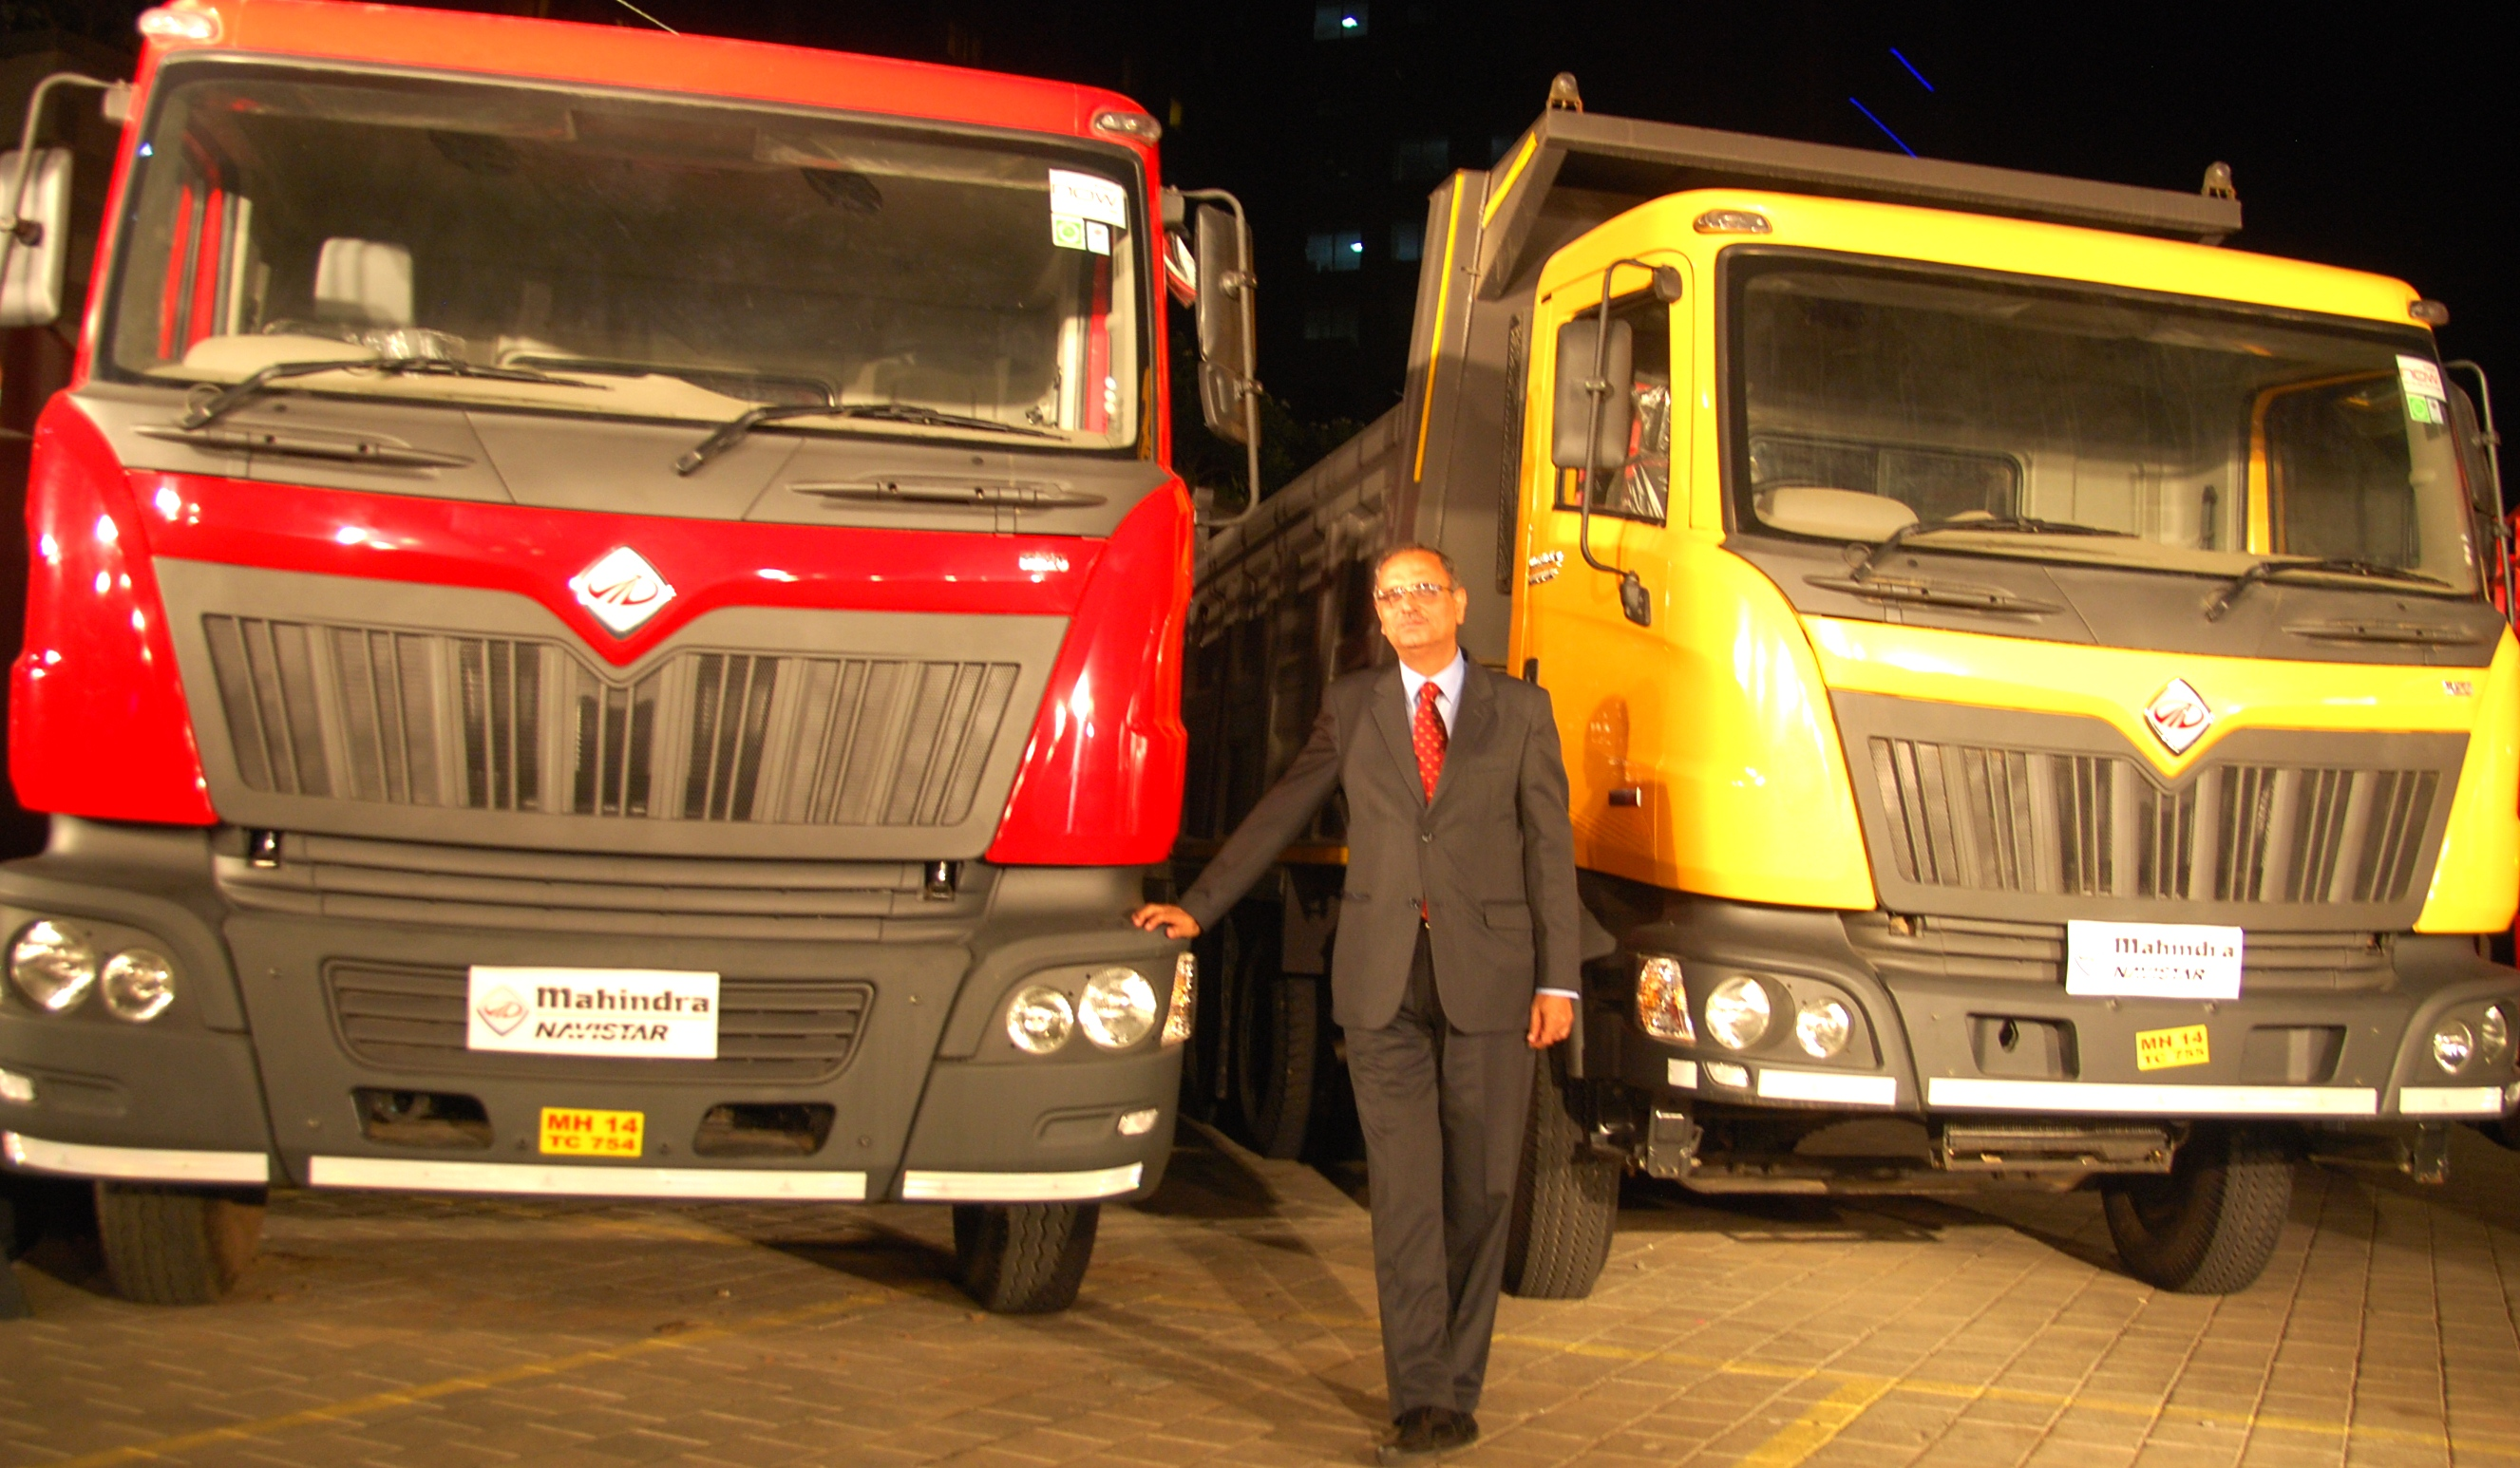 Mahindra Navistar Celebrates Its 5000th Truck Roll Out